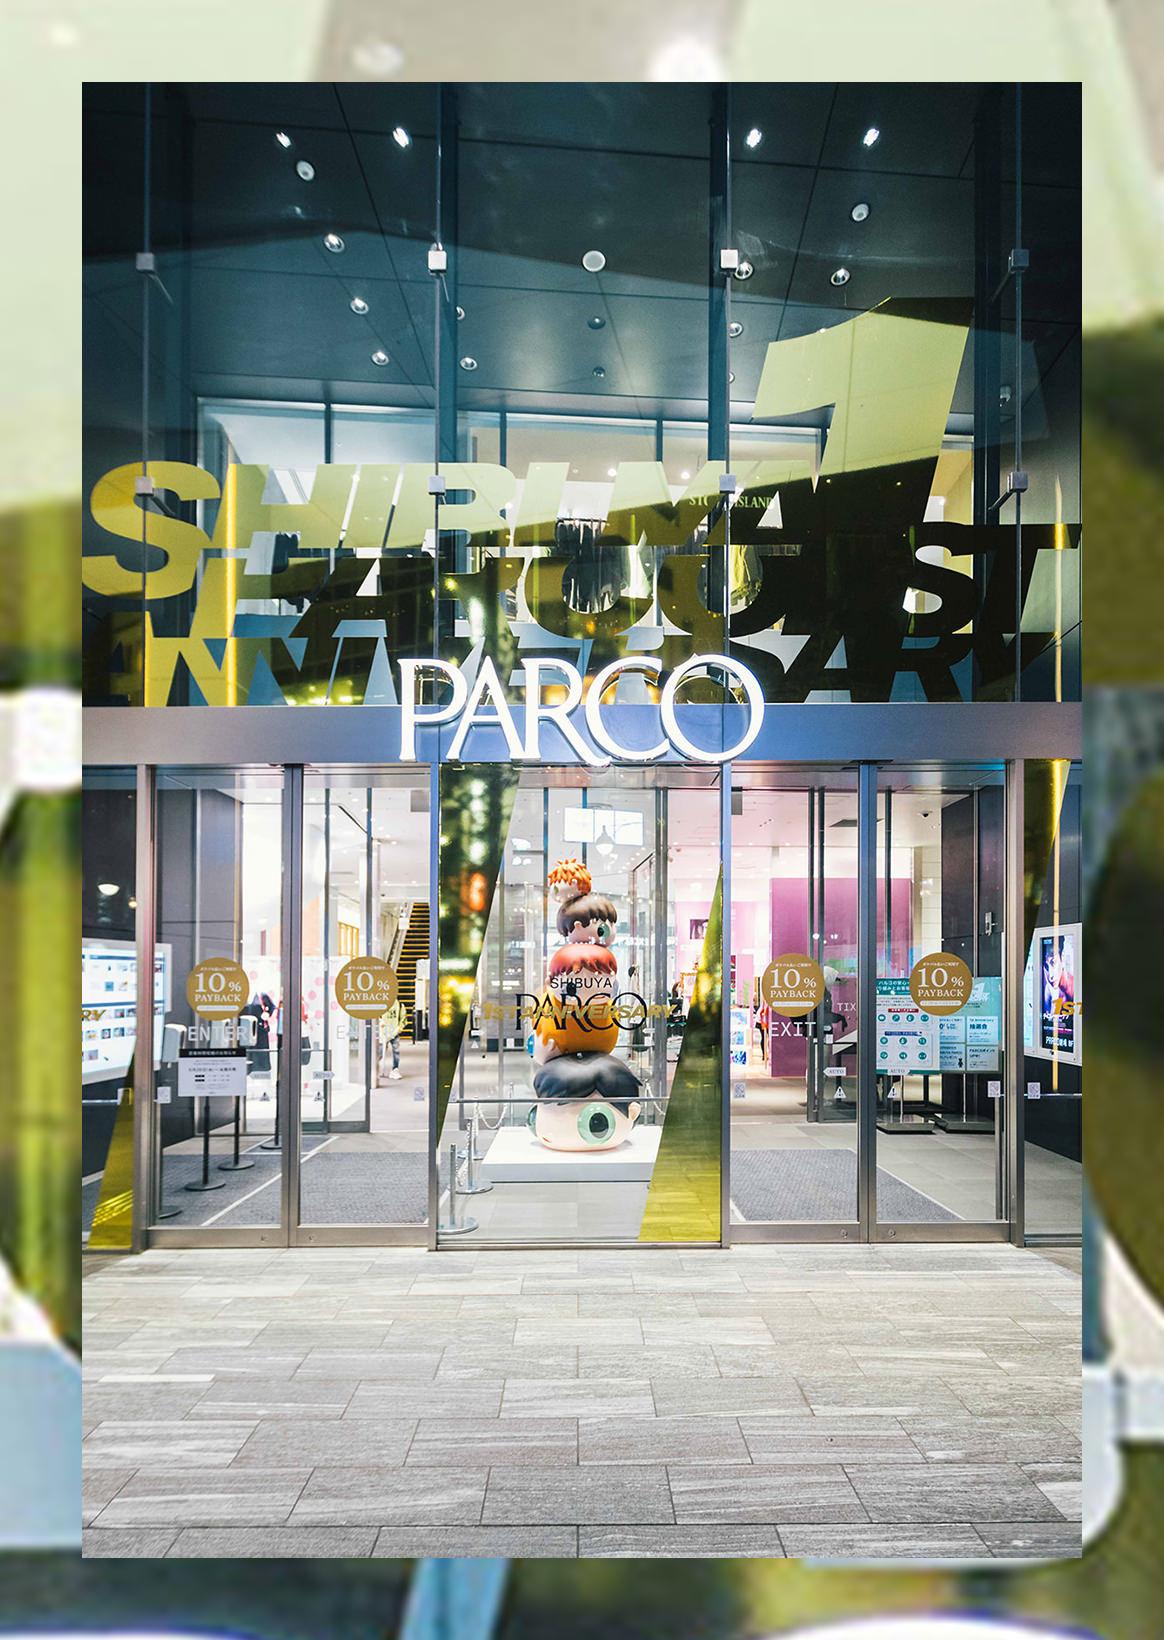 SHIBUYA PARCO 1st ANNIVERSARY|一周年を記念した限定品が集結。一夜限りのインスタレーションも